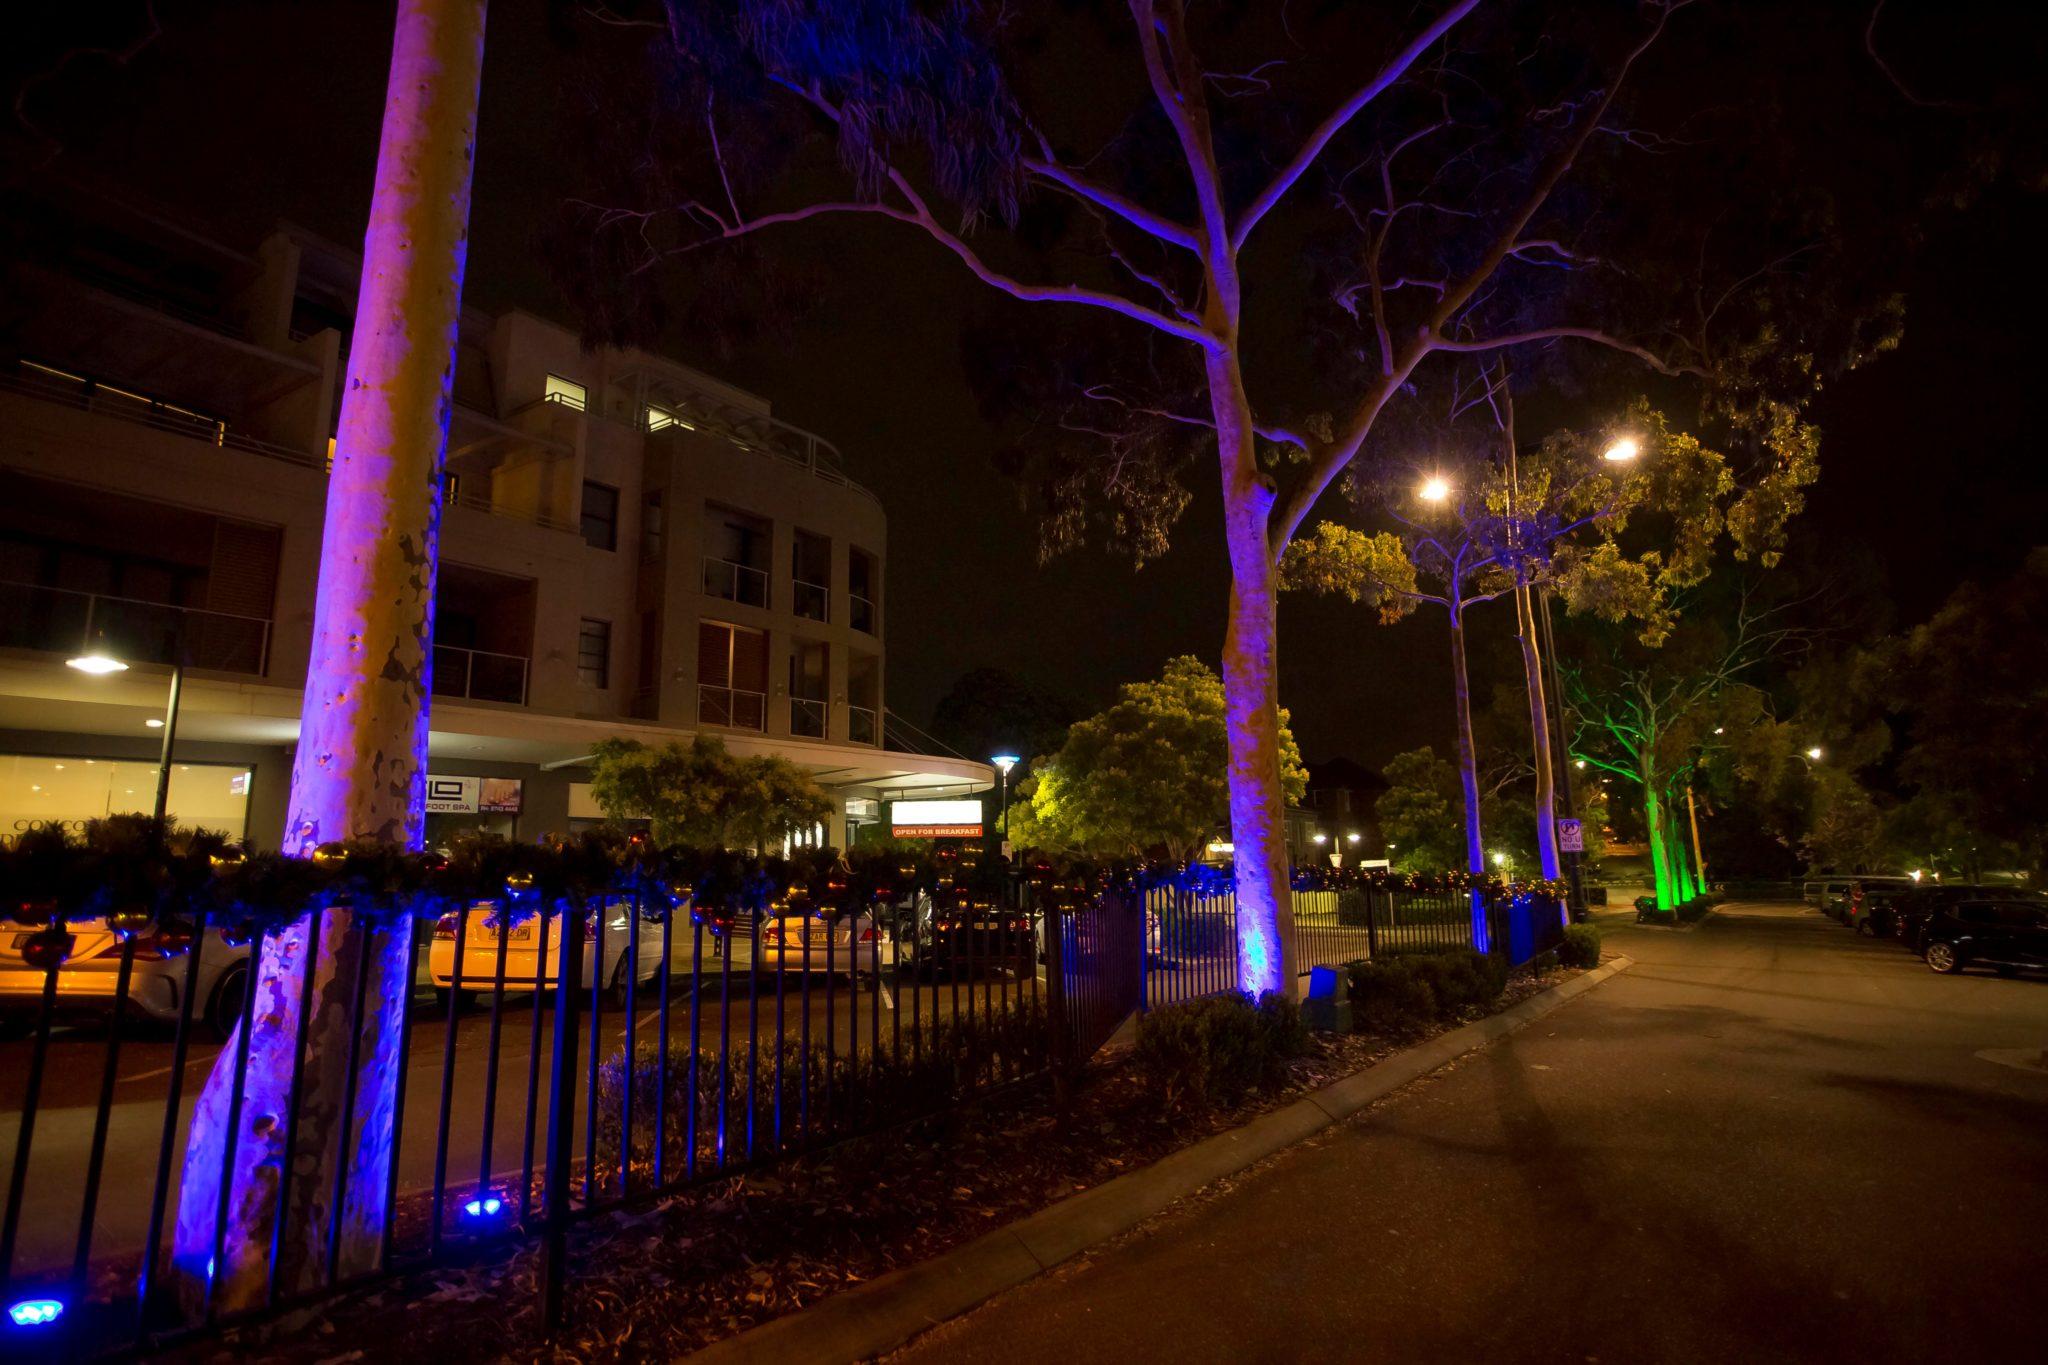 Gum tree light display at Majors Bay Road by Limelight Australia